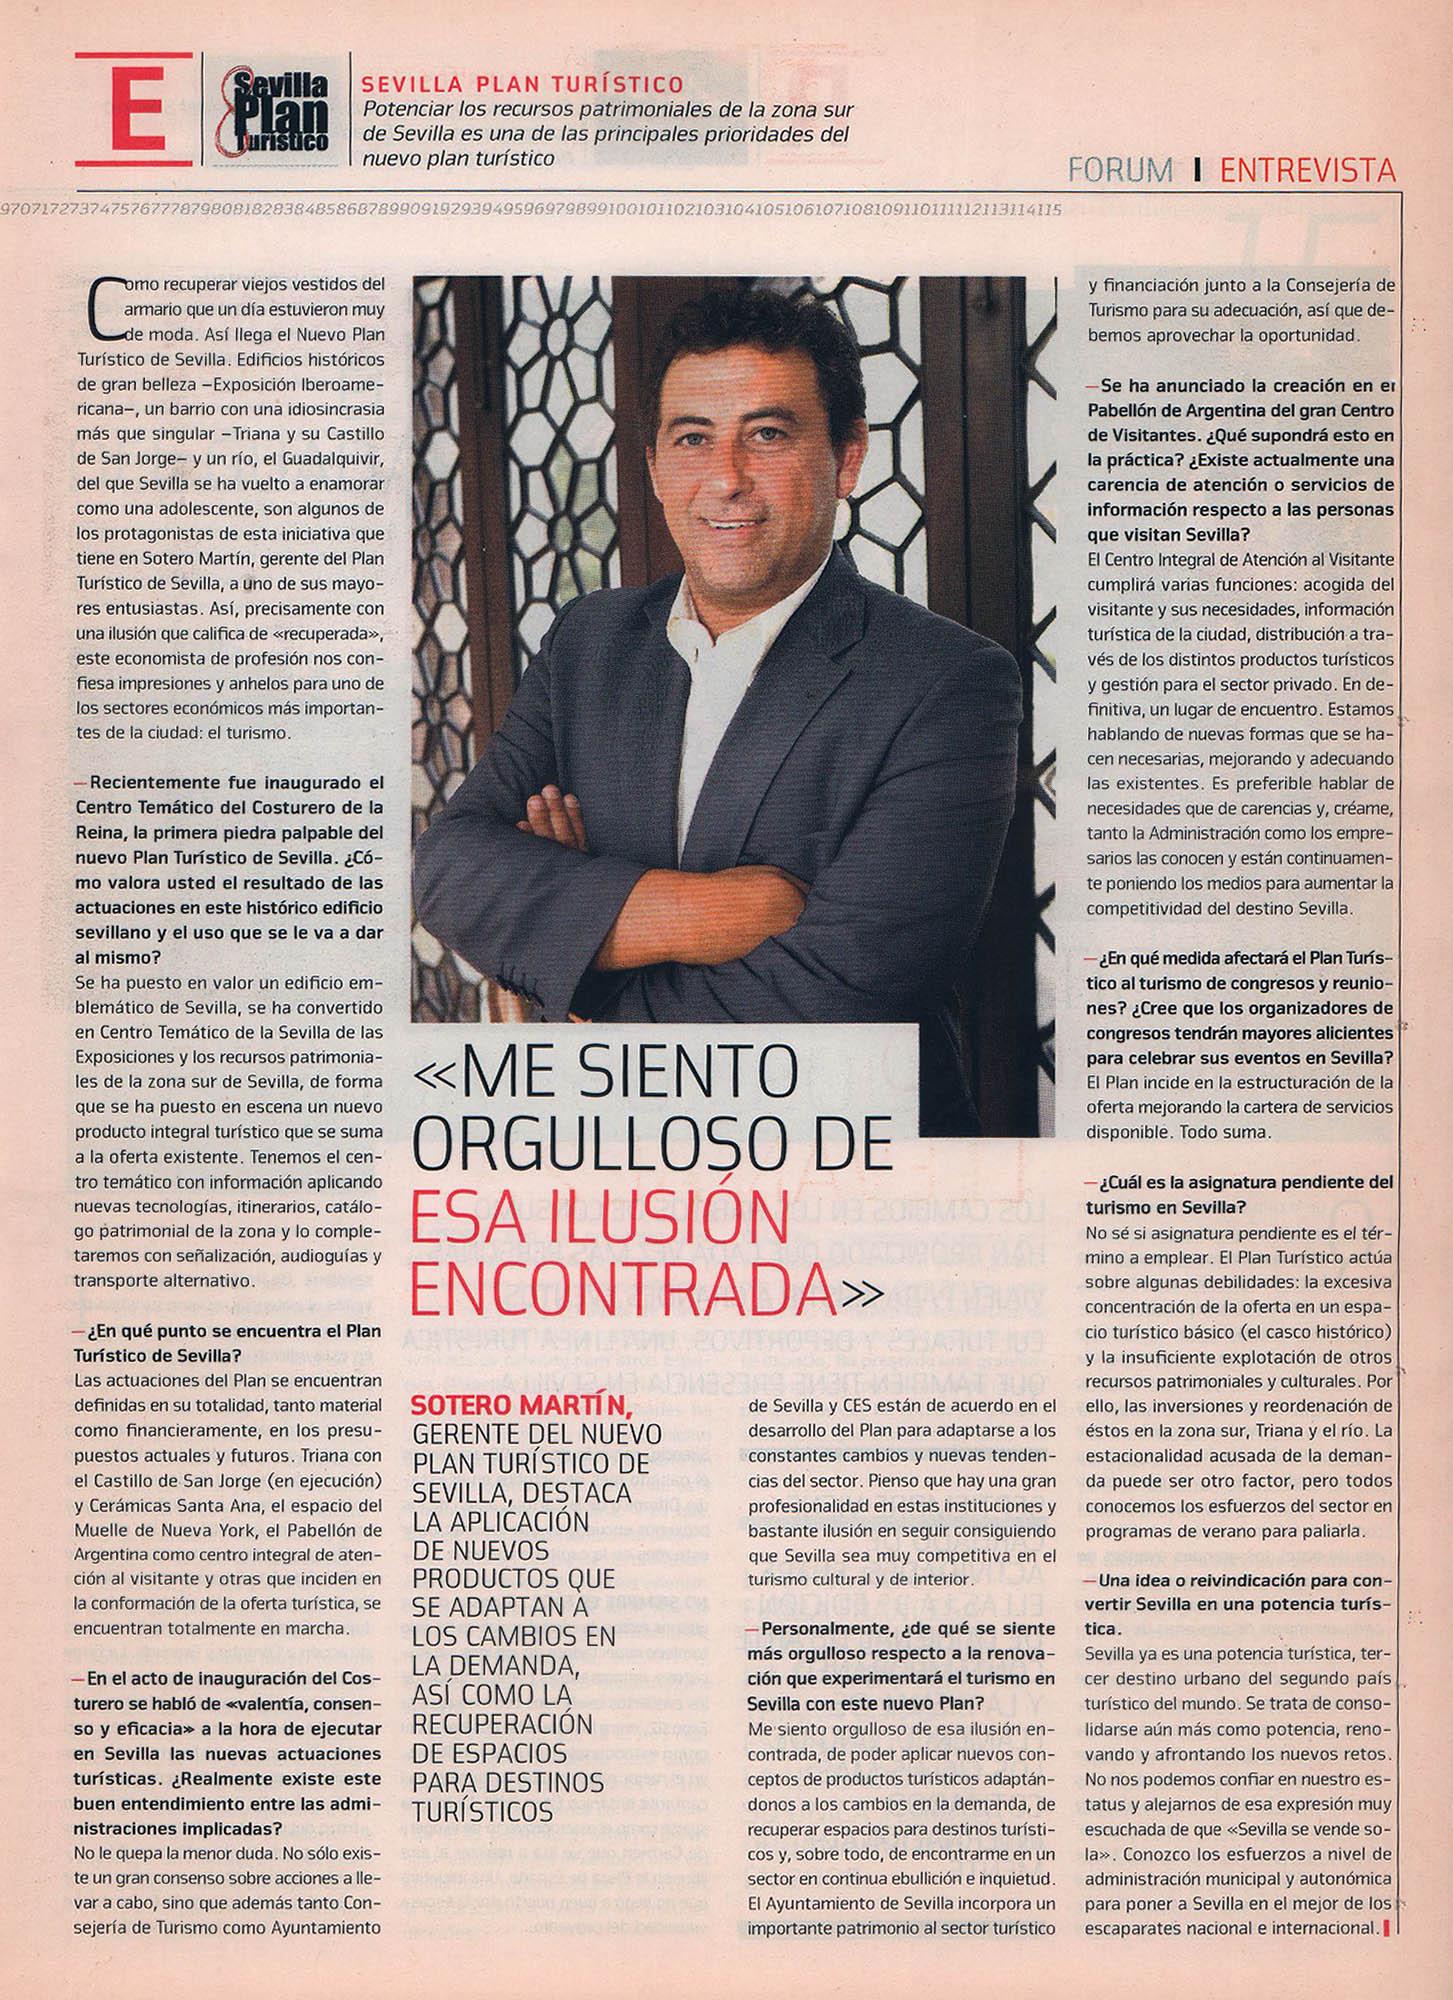 Sotero Martín - Gerente Plan Turístico Sevilla | Fórum - Suplemento ABC de Sevilla | sep 2008